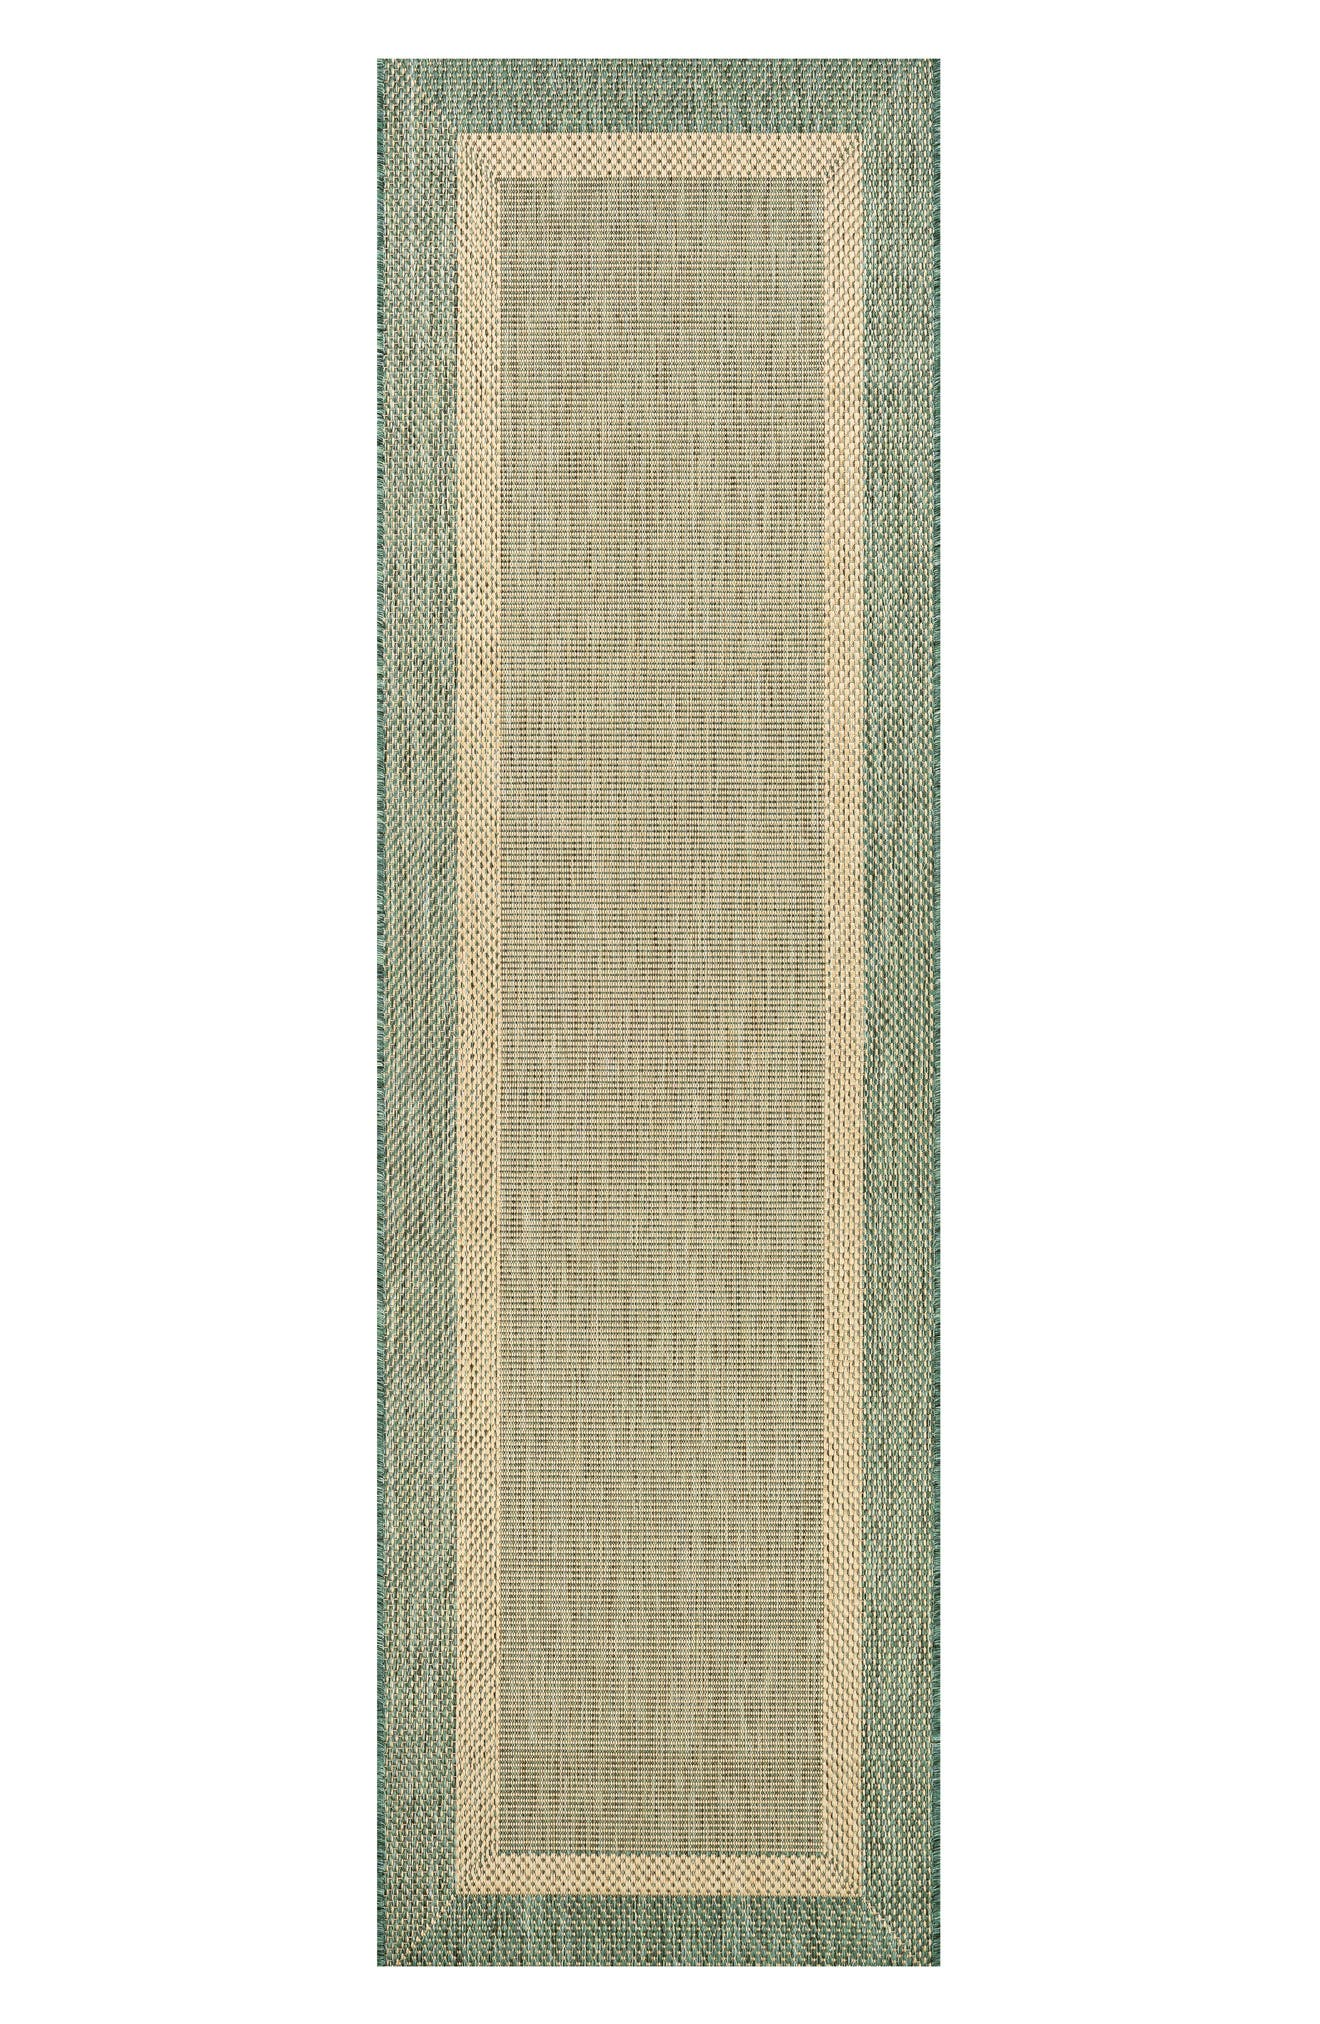 Stria Texture Indoor/Outdoor Rug,                             Alternate thumbnail 3, color,                             NATURAL/ GREEN